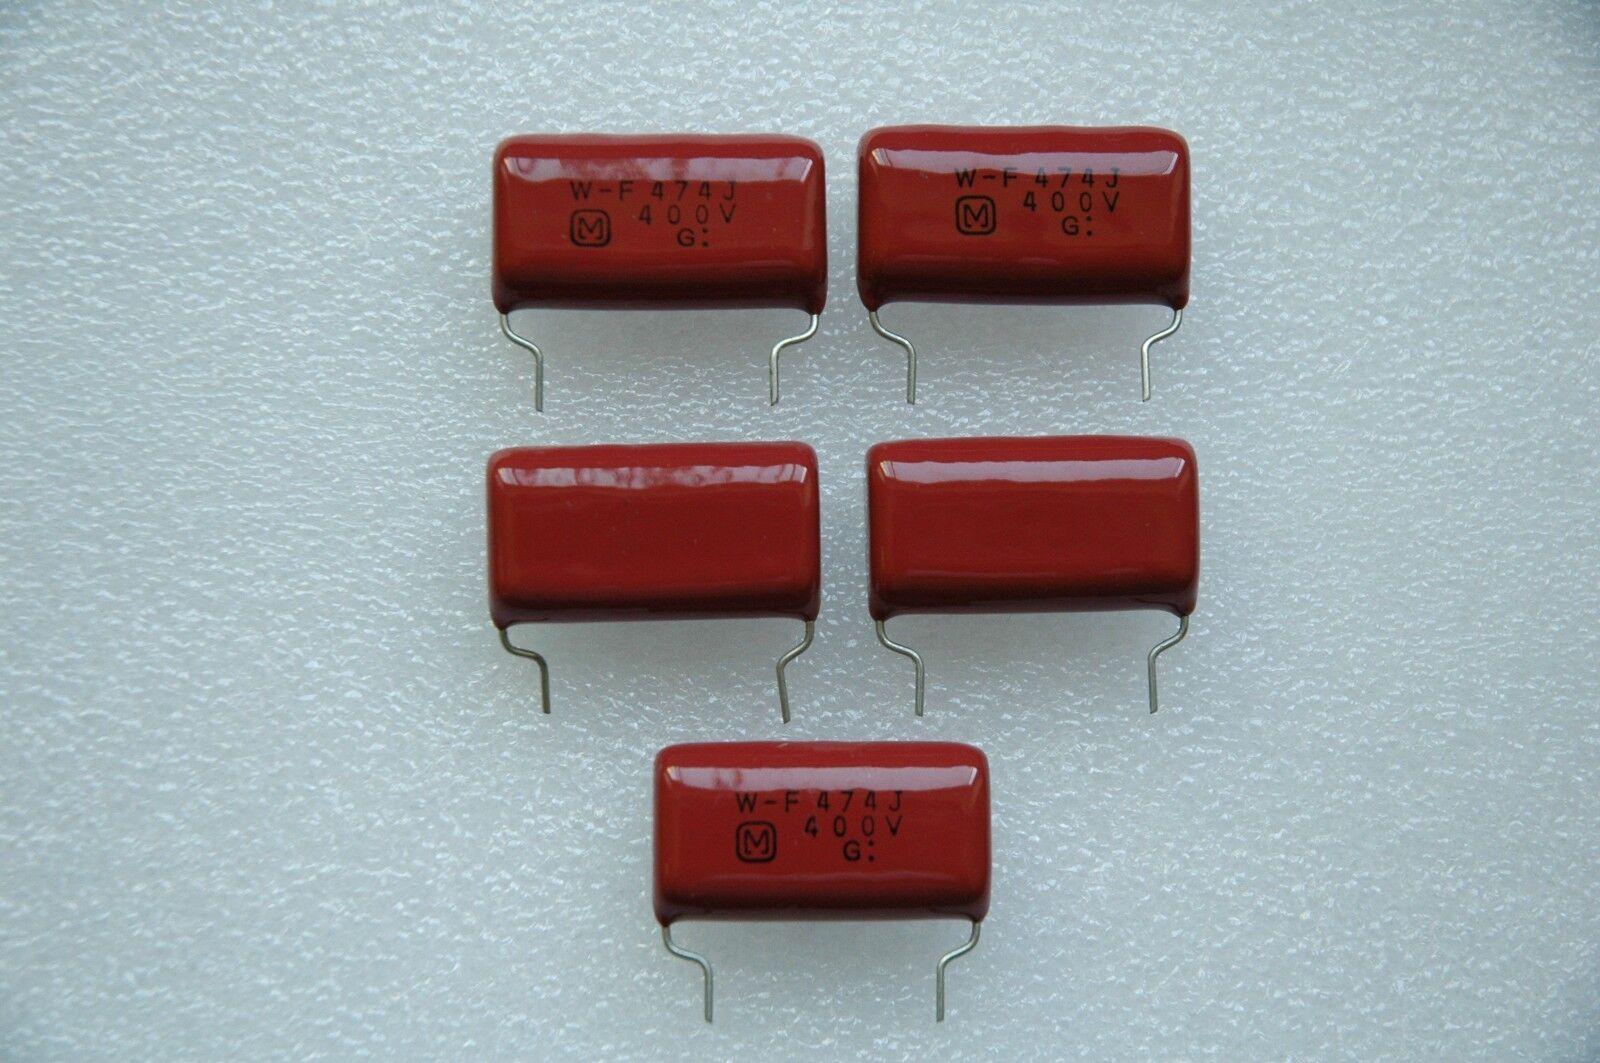 ± 5/% PP Series ECWF A Polypropylene Film Capacitor 0.47 µF 450 V